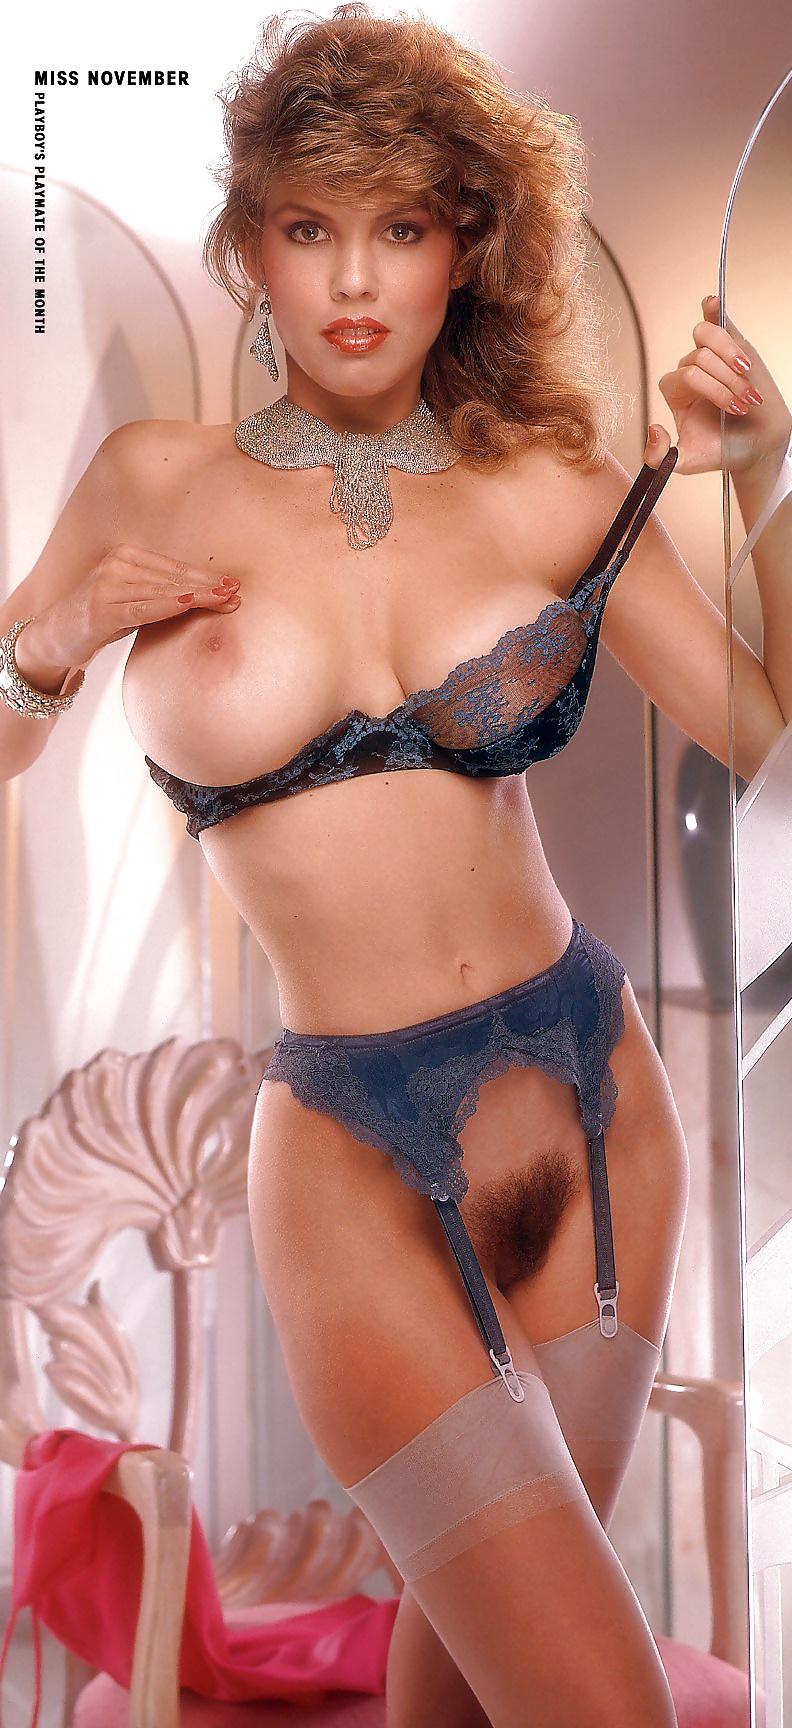 Playboy Playmate 33 - 12 Pics  Xhamster-2698